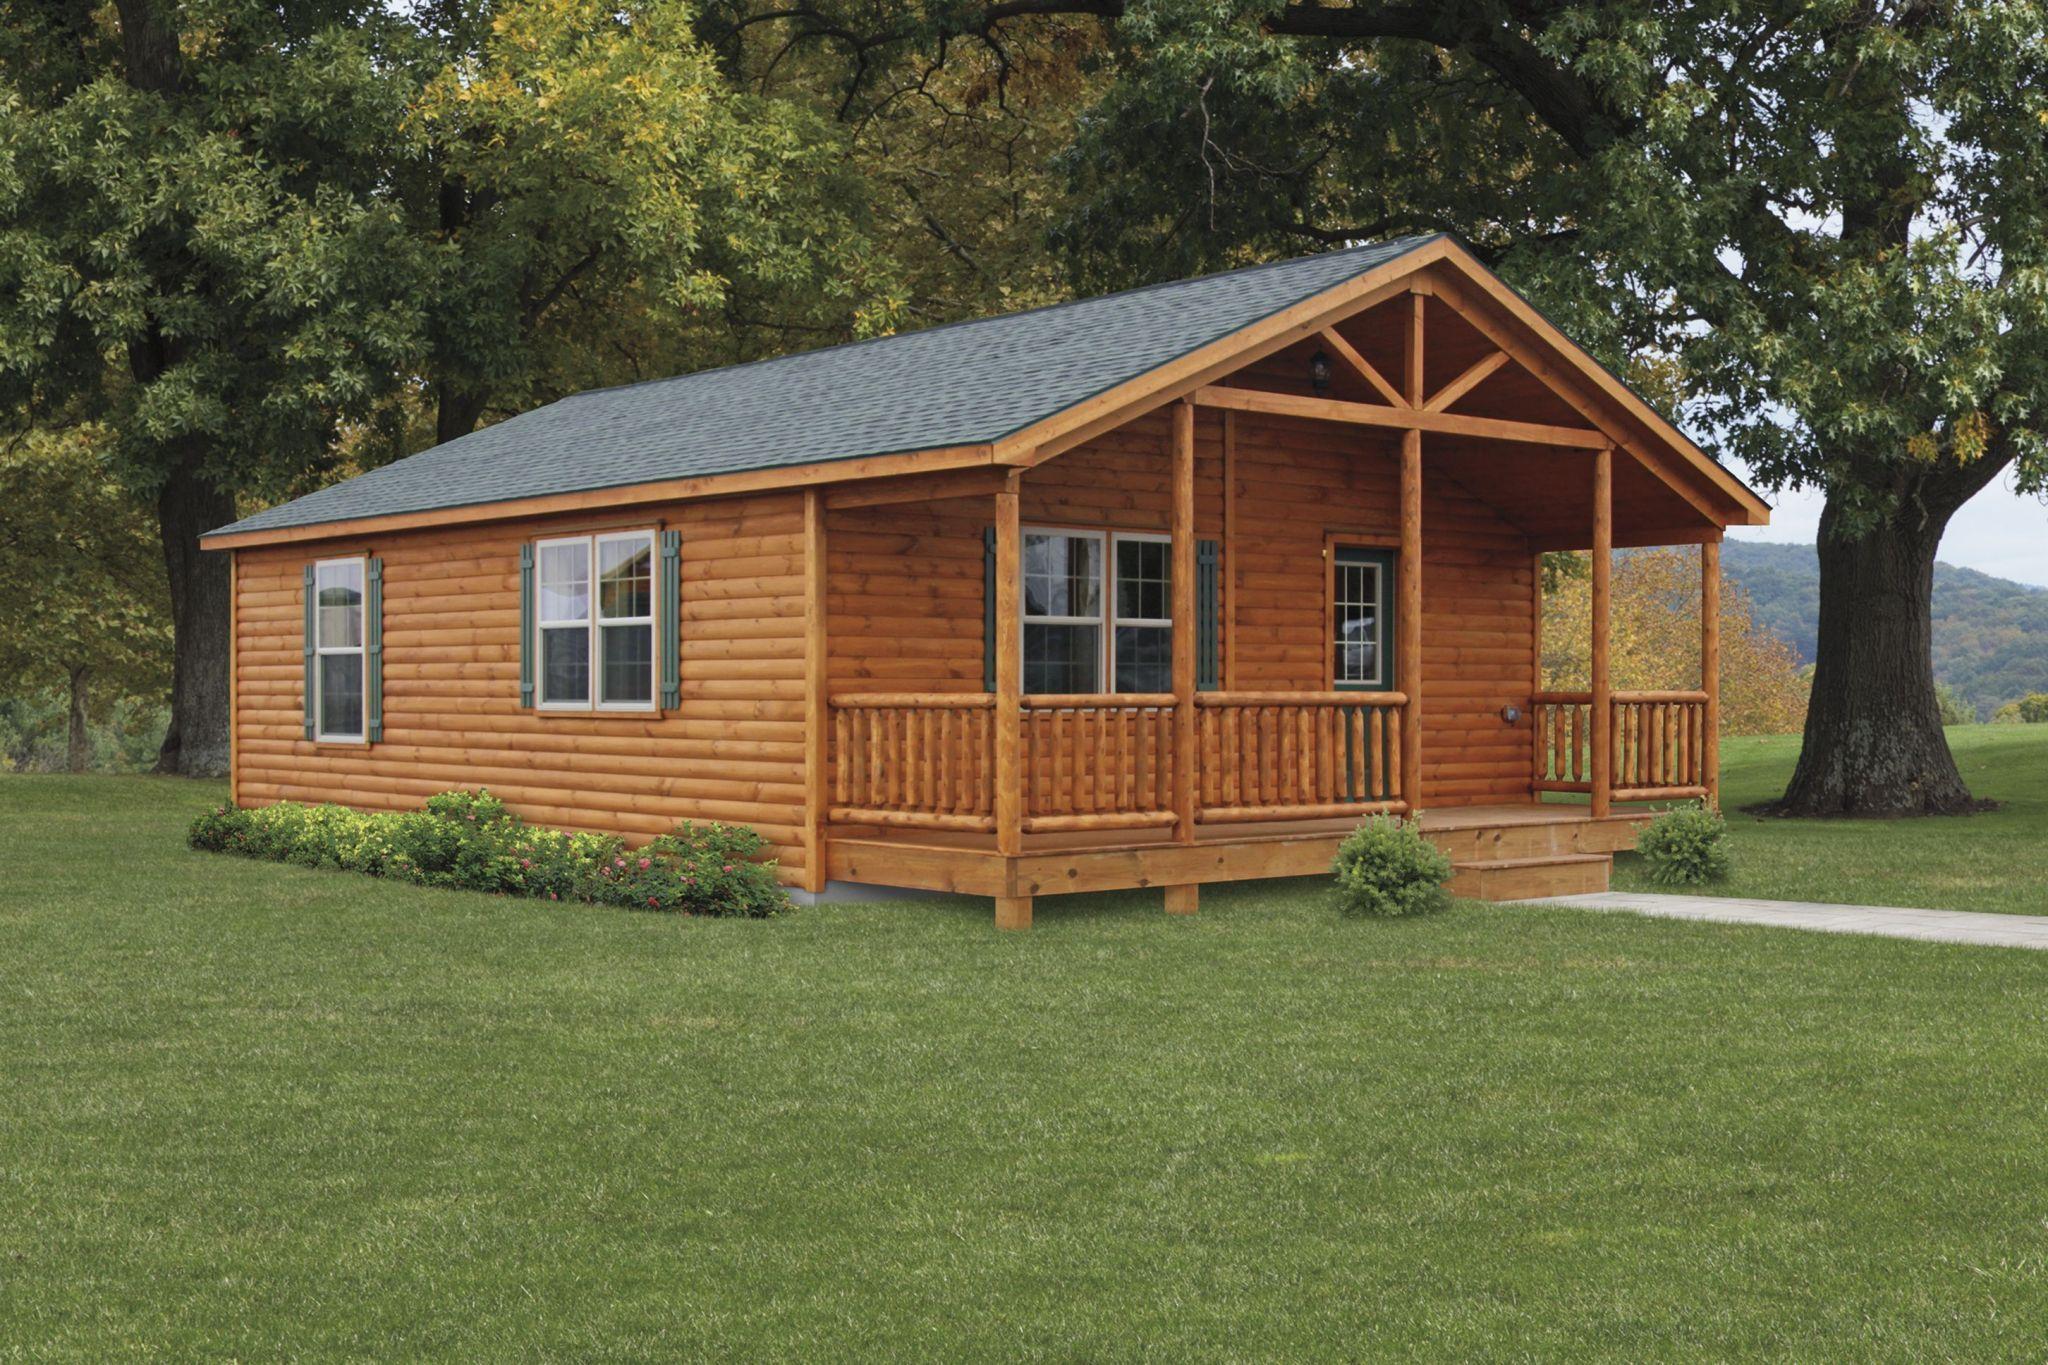 Modular Log Homes Floor Plans Log Cabin Modular Homes Log Cabin Homes Modular Log Cabin